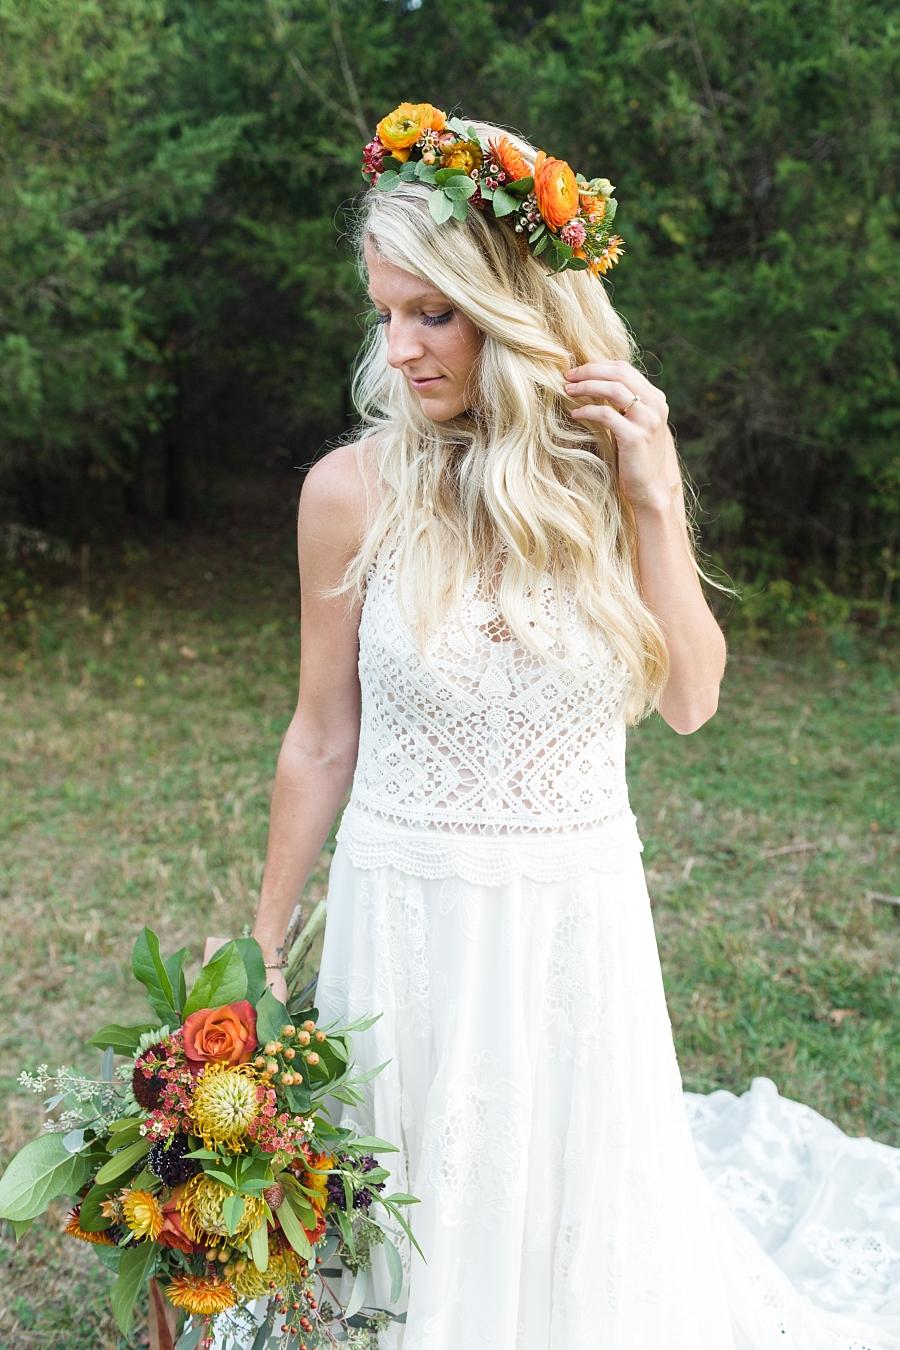 Stacy-Anderson-Photography-Cedarwood-Weddings-Nashville-Destination-Wedding-Photographer_0045.jpg